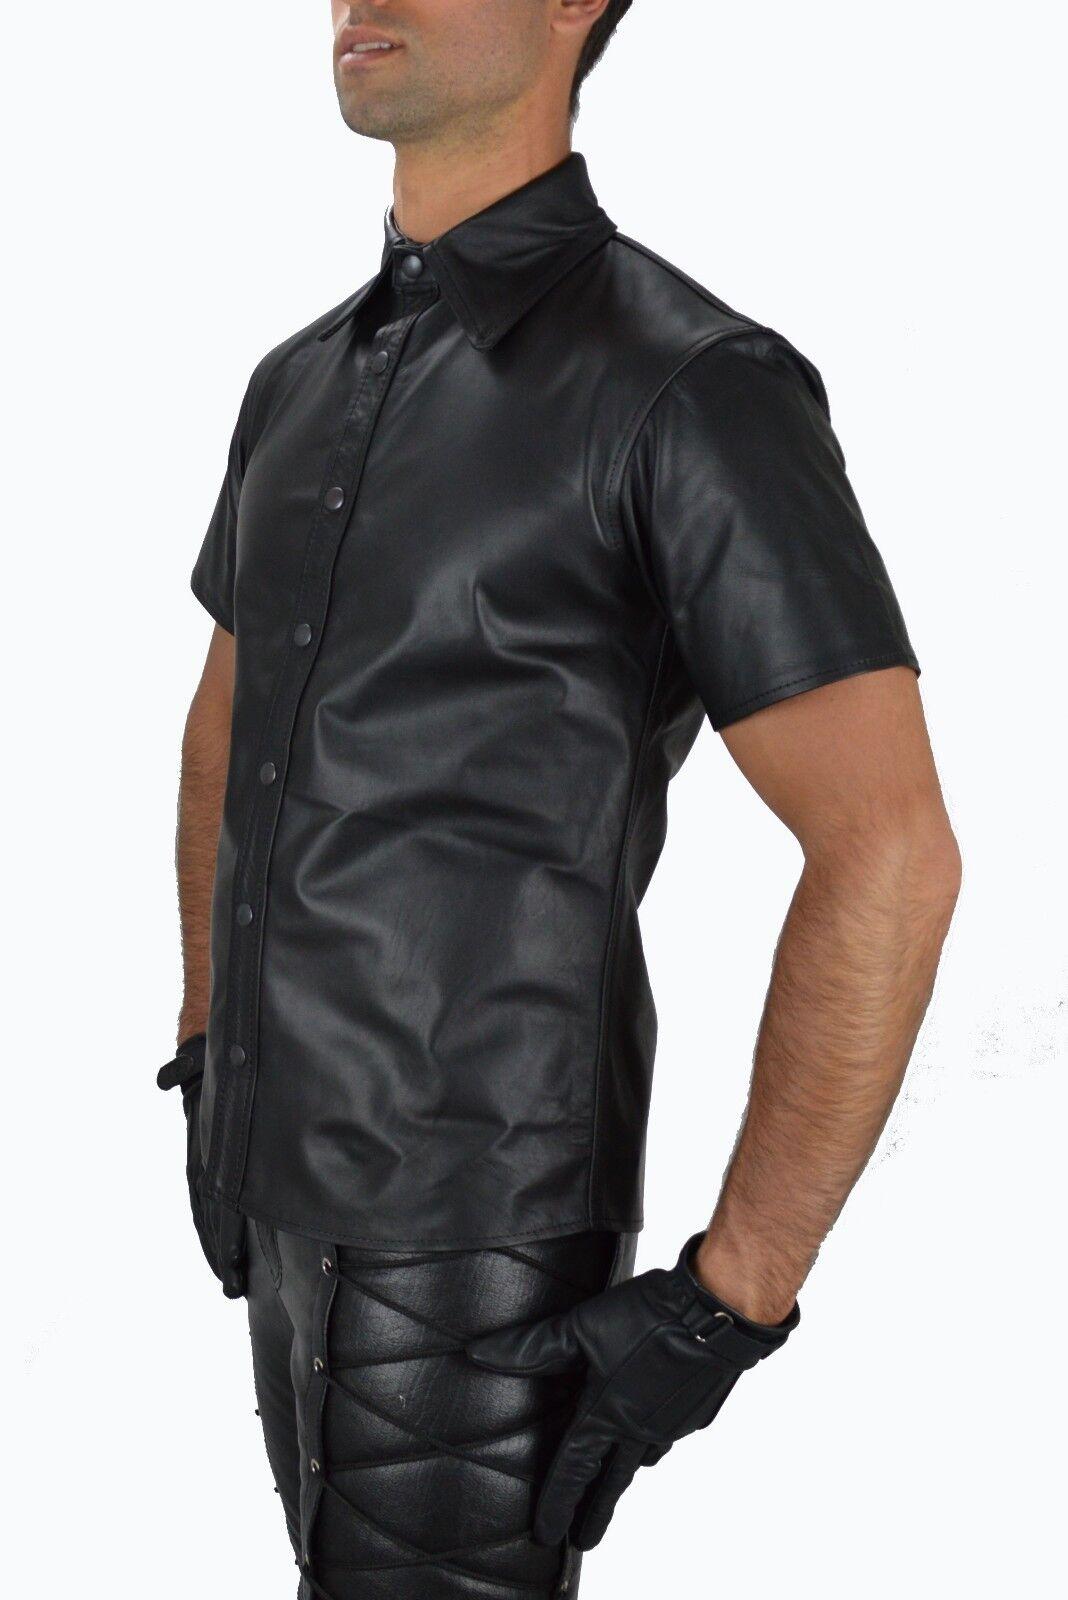 Awanstar Hochwertige Lederhemd,Chemise Cuir,Napa Leder Hemd,Leather shirt  S-3XL